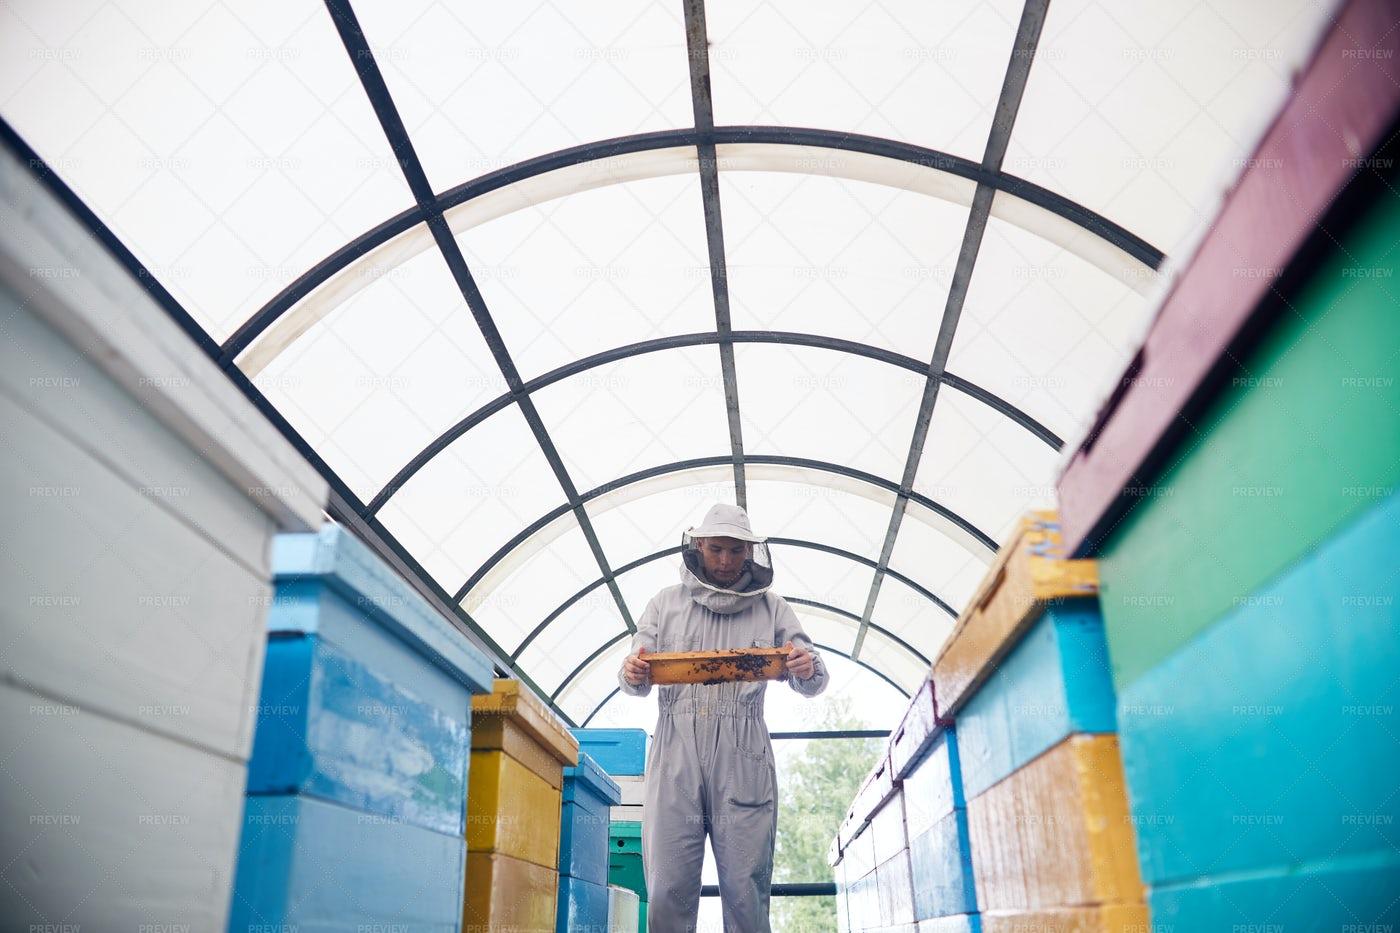 Beekeeper In Modern Apiary: Stock Photos